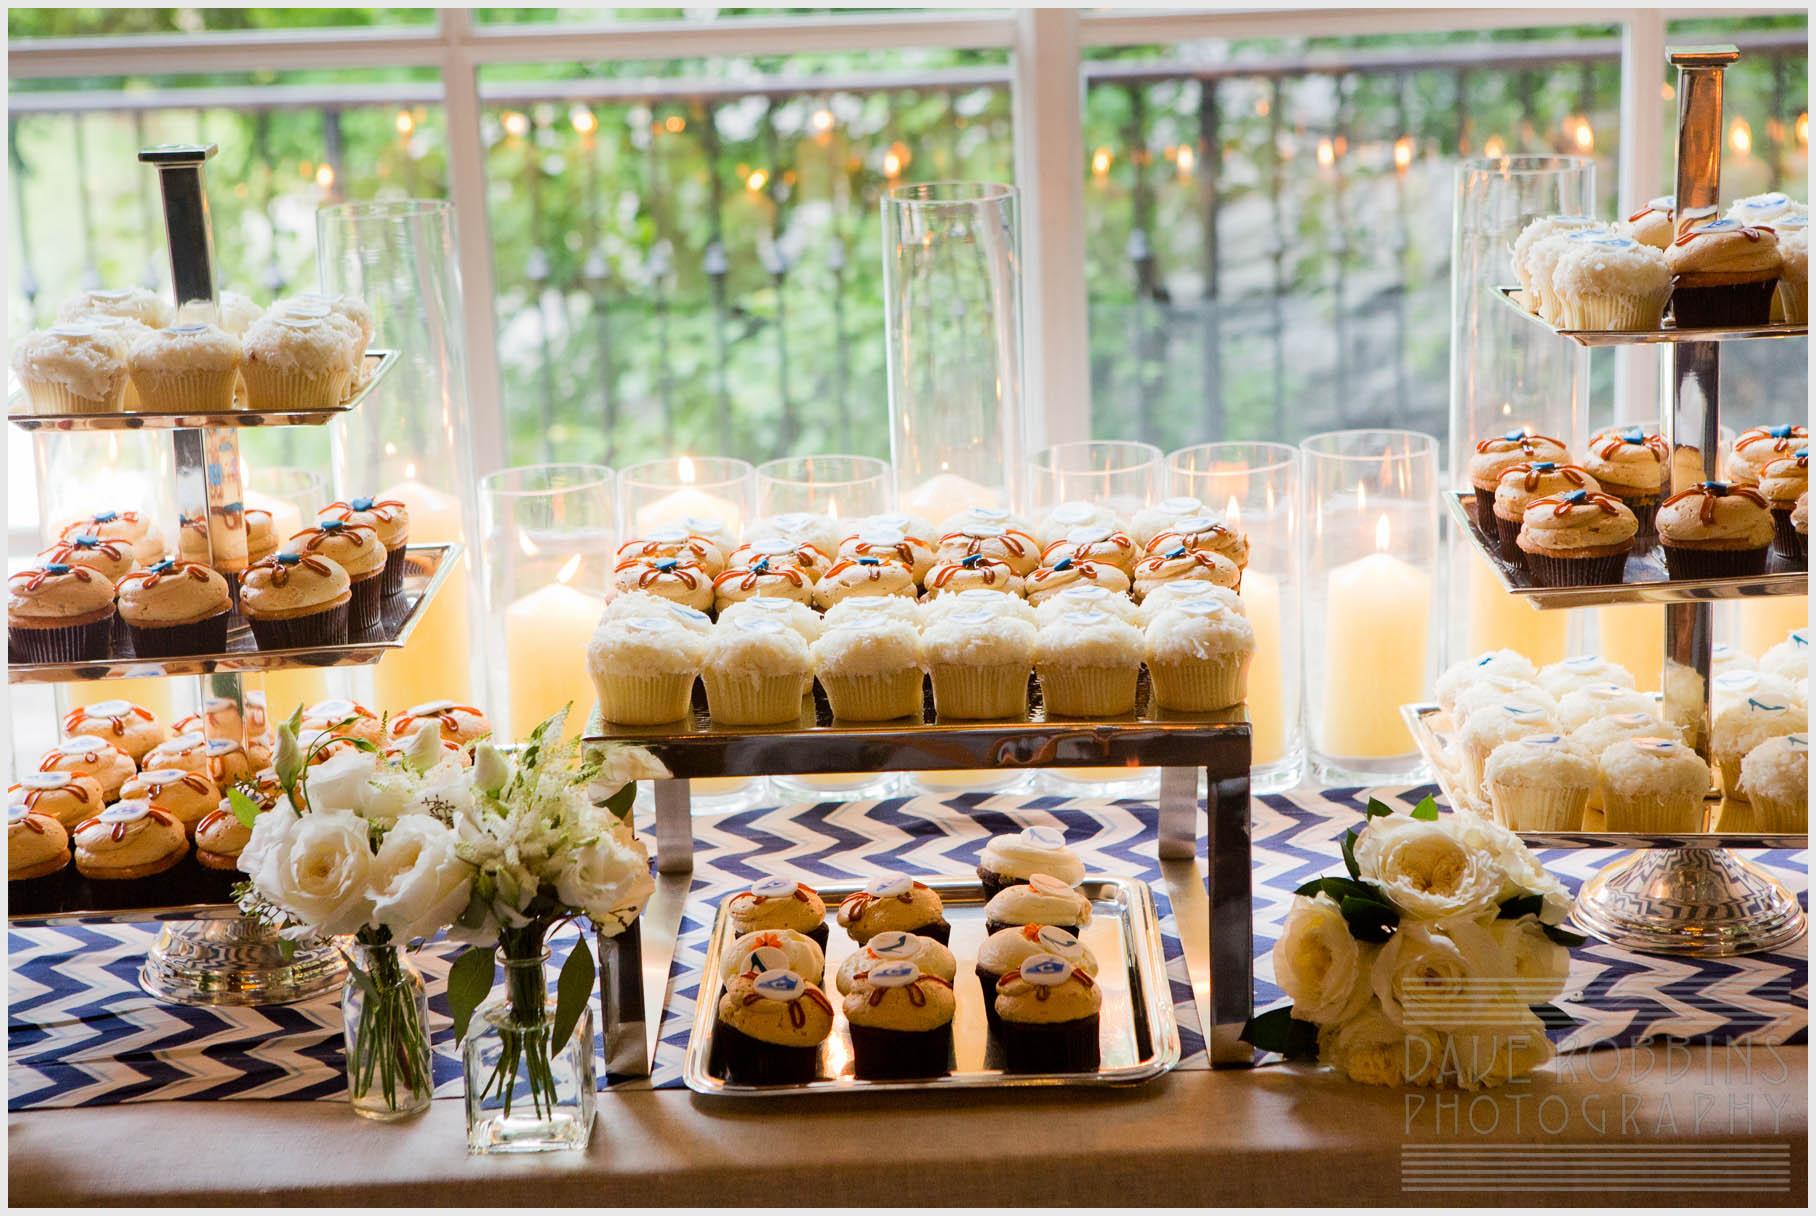 cupcake-cute-dessert-display-chevron-modern